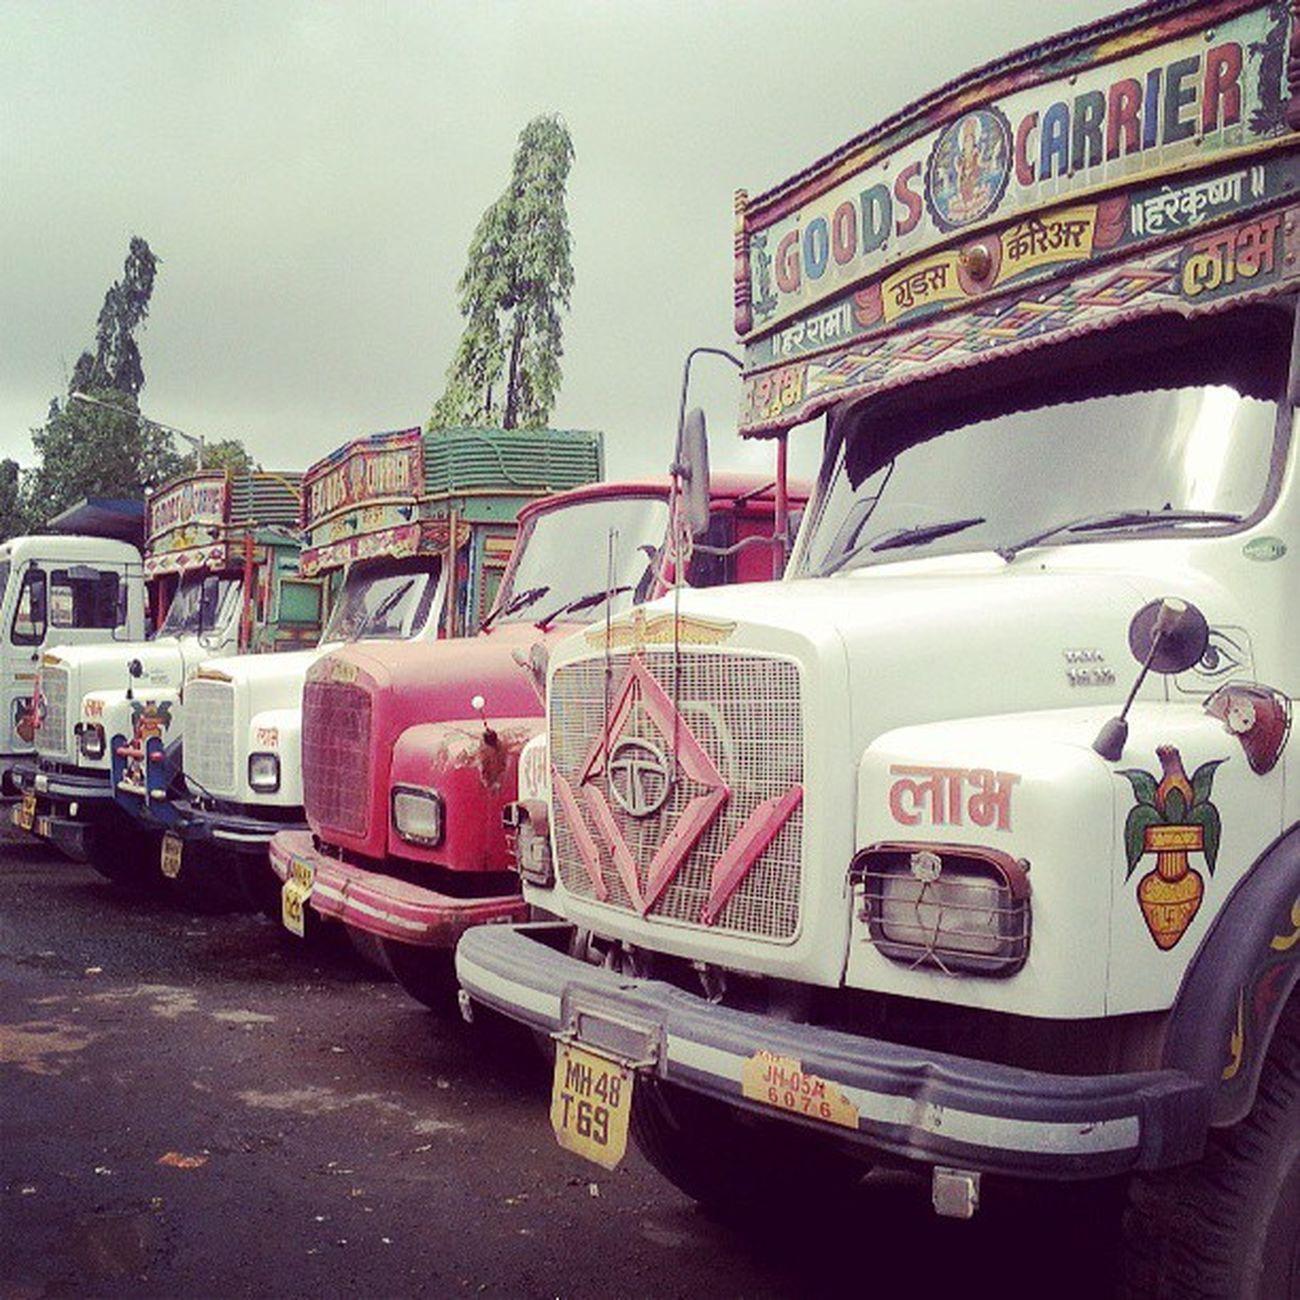 Mumbai Truck Carriers Dailypics Random Followme Followback Like Likeback College Road Parking Loads Instapic Instamood Iphonenography Job Followme